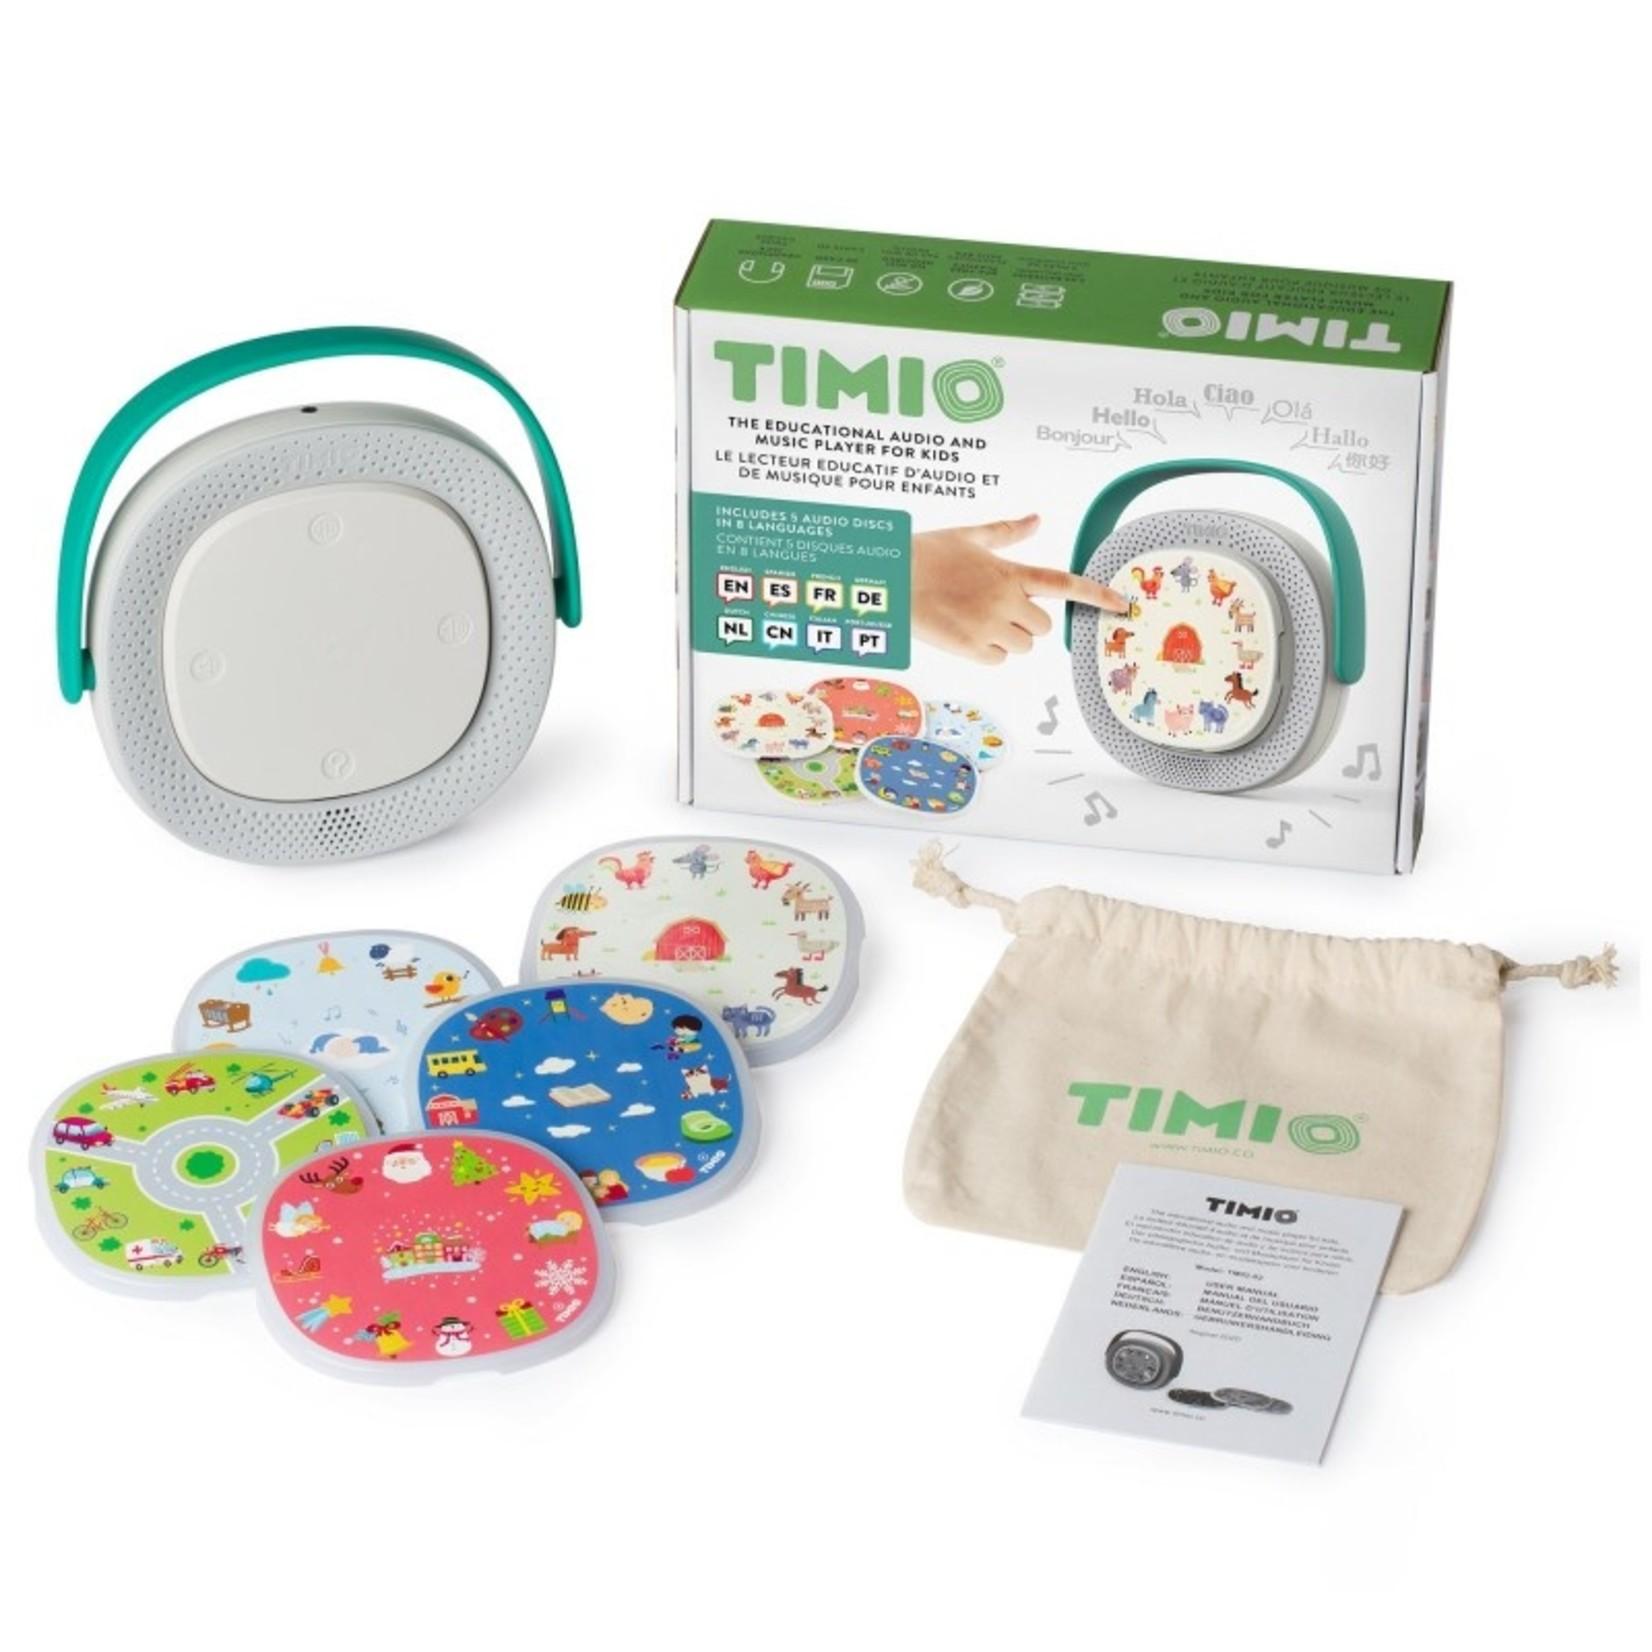 Timio Timio Player + 5 discs